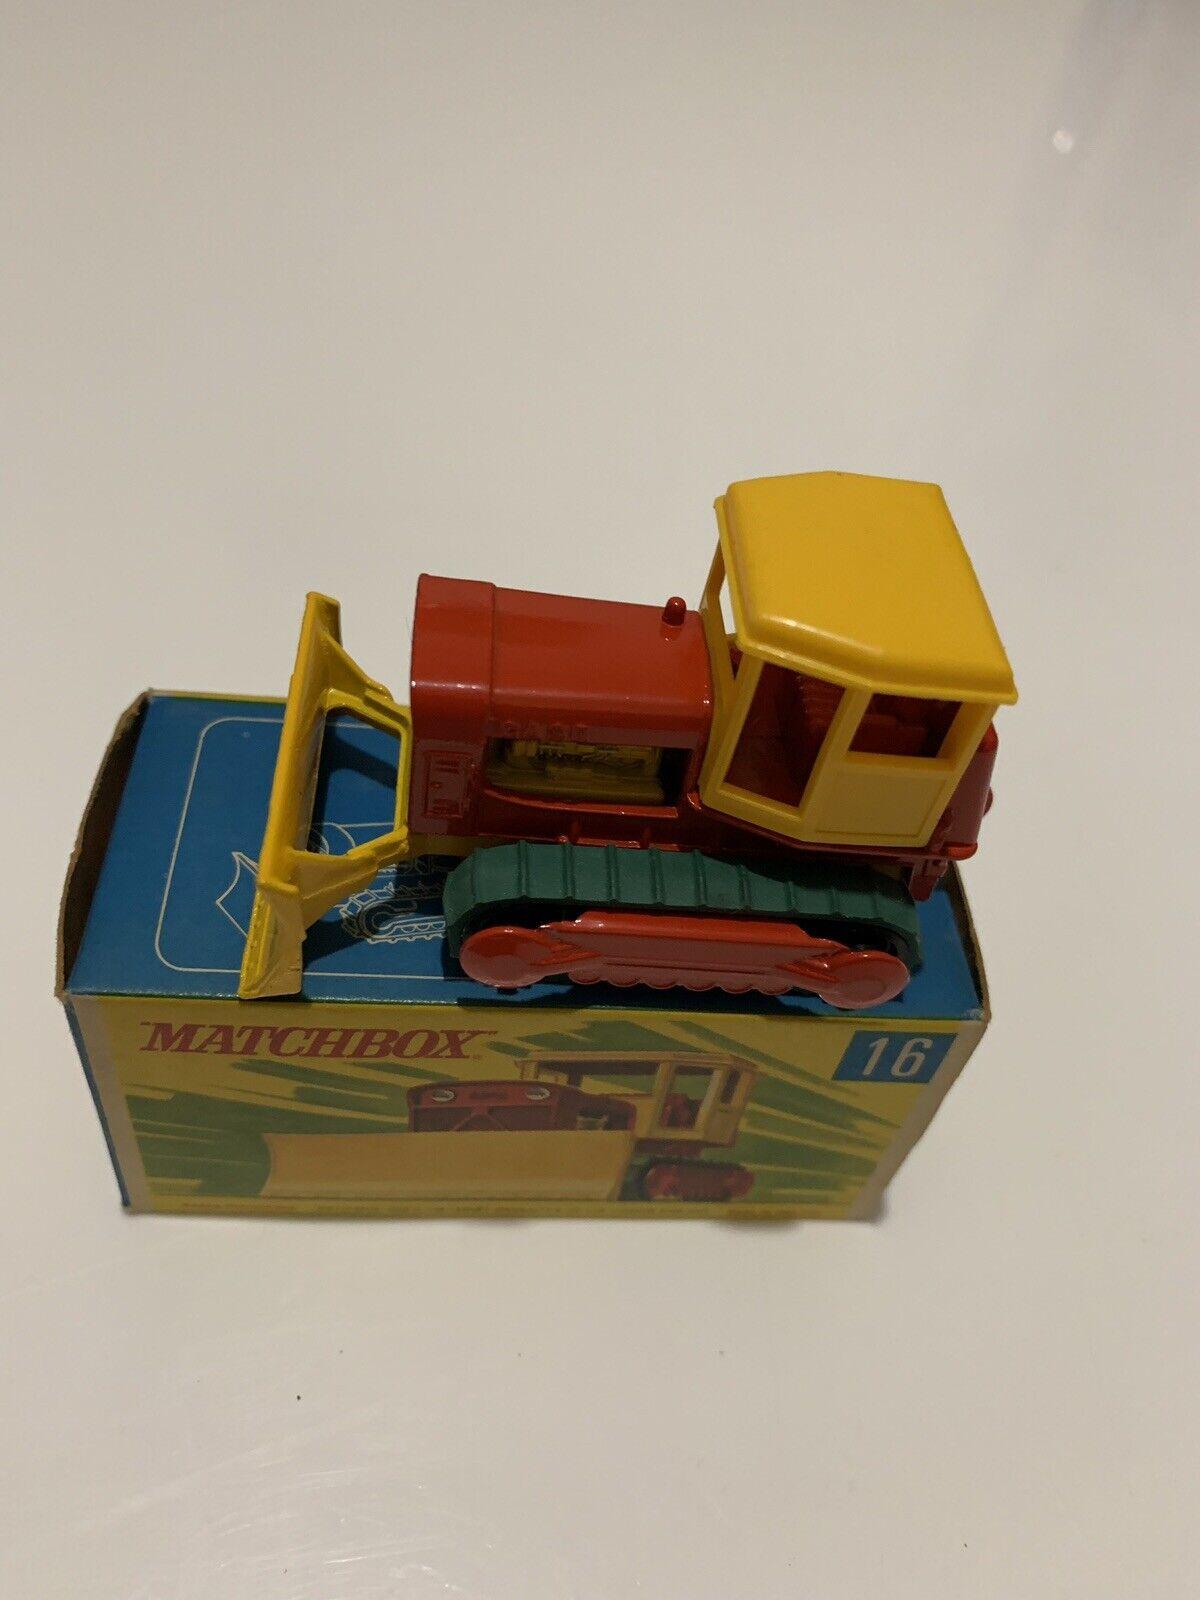 Matchbox Superfast N16 Case Tractor Bulldozer Mint